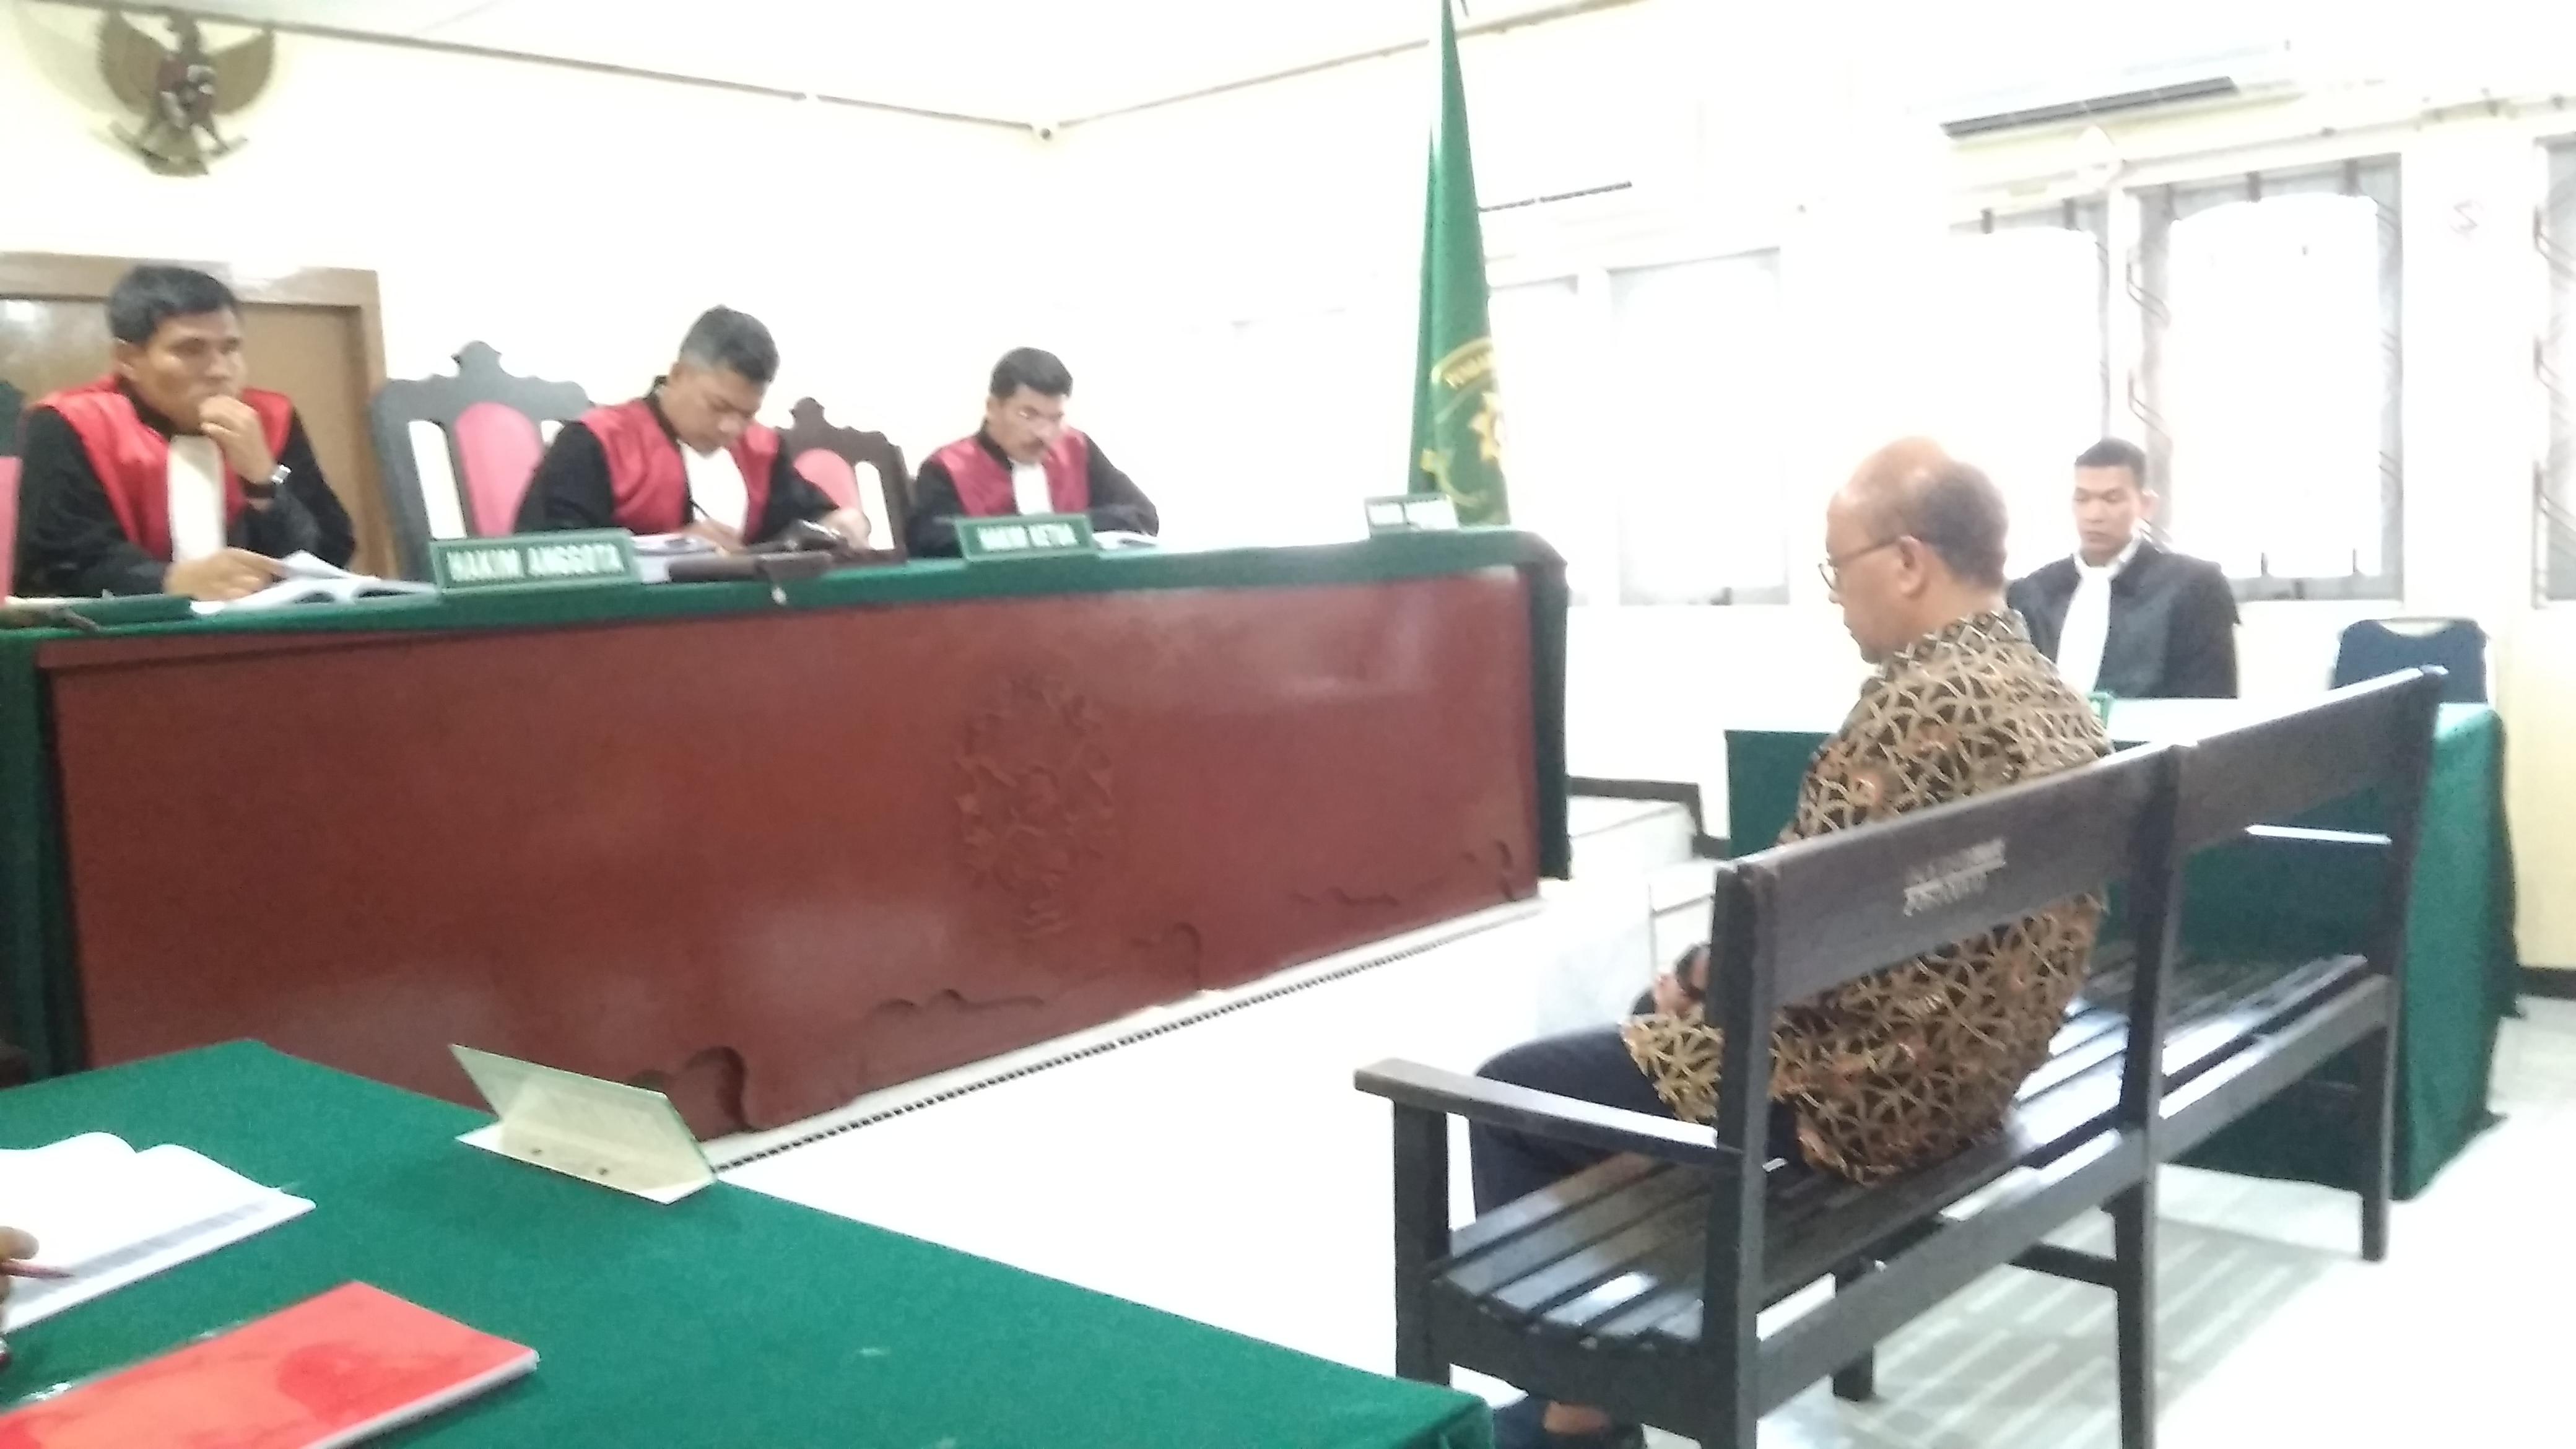 Terima Suap, Mantan Kadis LH Kota Batam Dituntut 15 Bulan Penjara